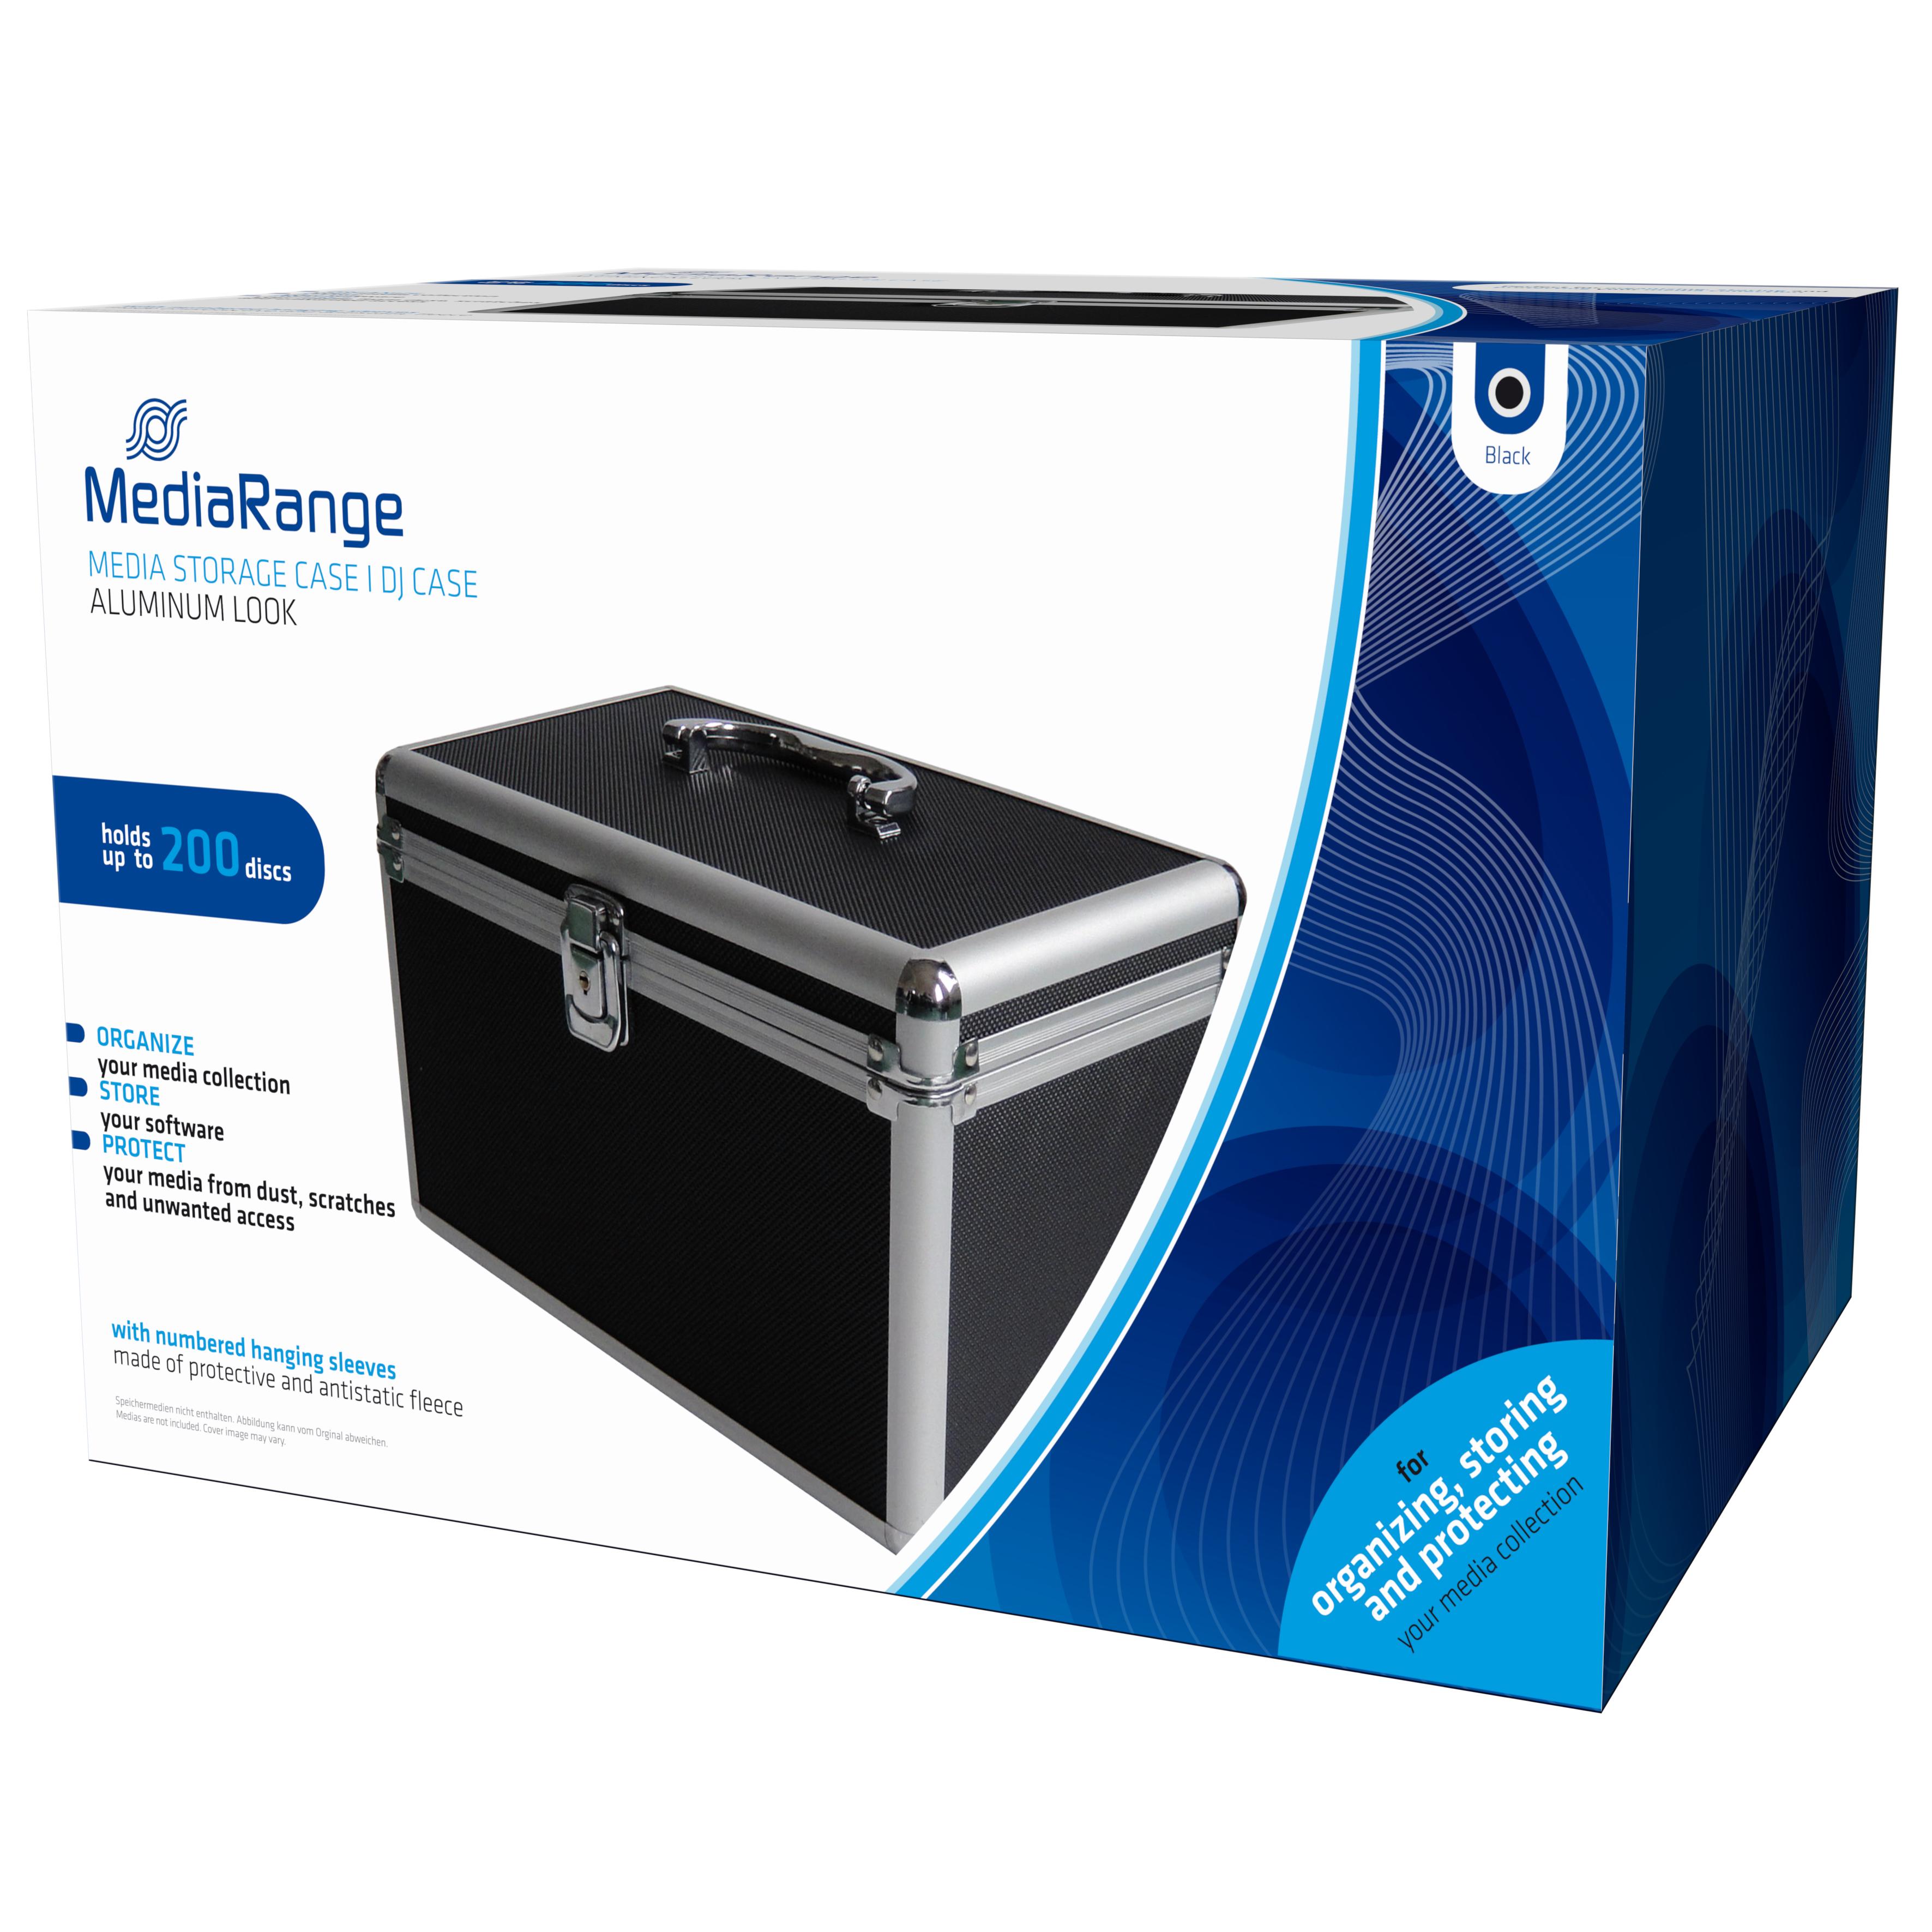 MEDIARANGE BOX71 - Gehäusebox - 200 Disks - Schwarz - Fleece - Kunststoff - Holz - 120 mm - Aluminium